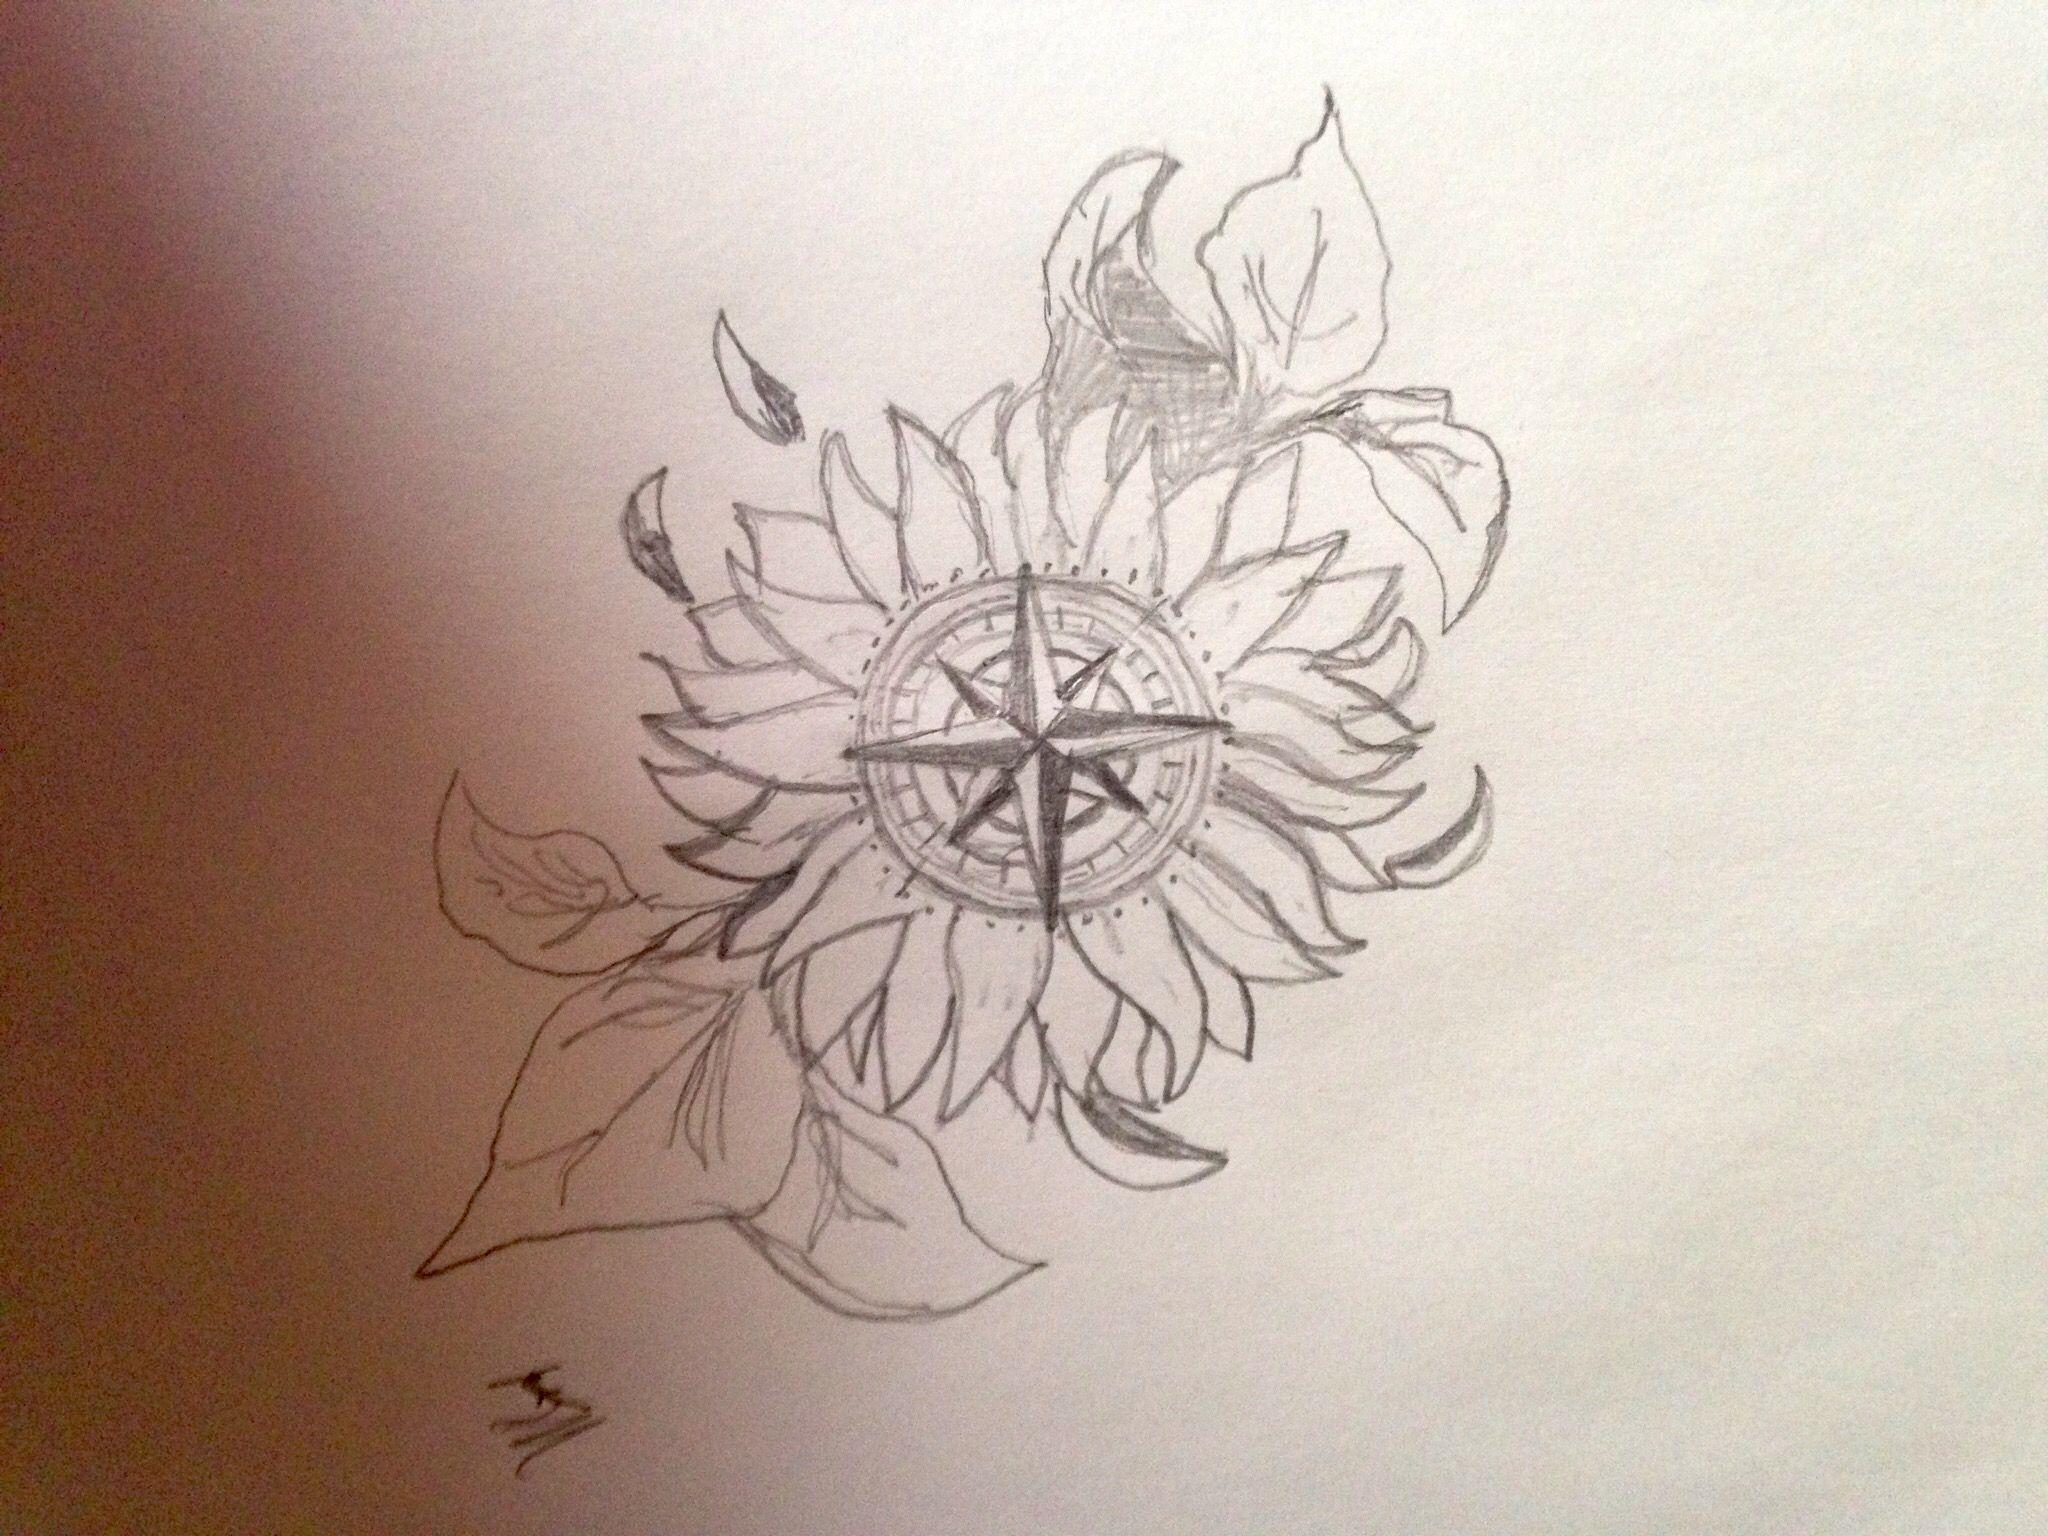 Line Drawing Sunflower Tattoo : Sunflower compass ink tattoos